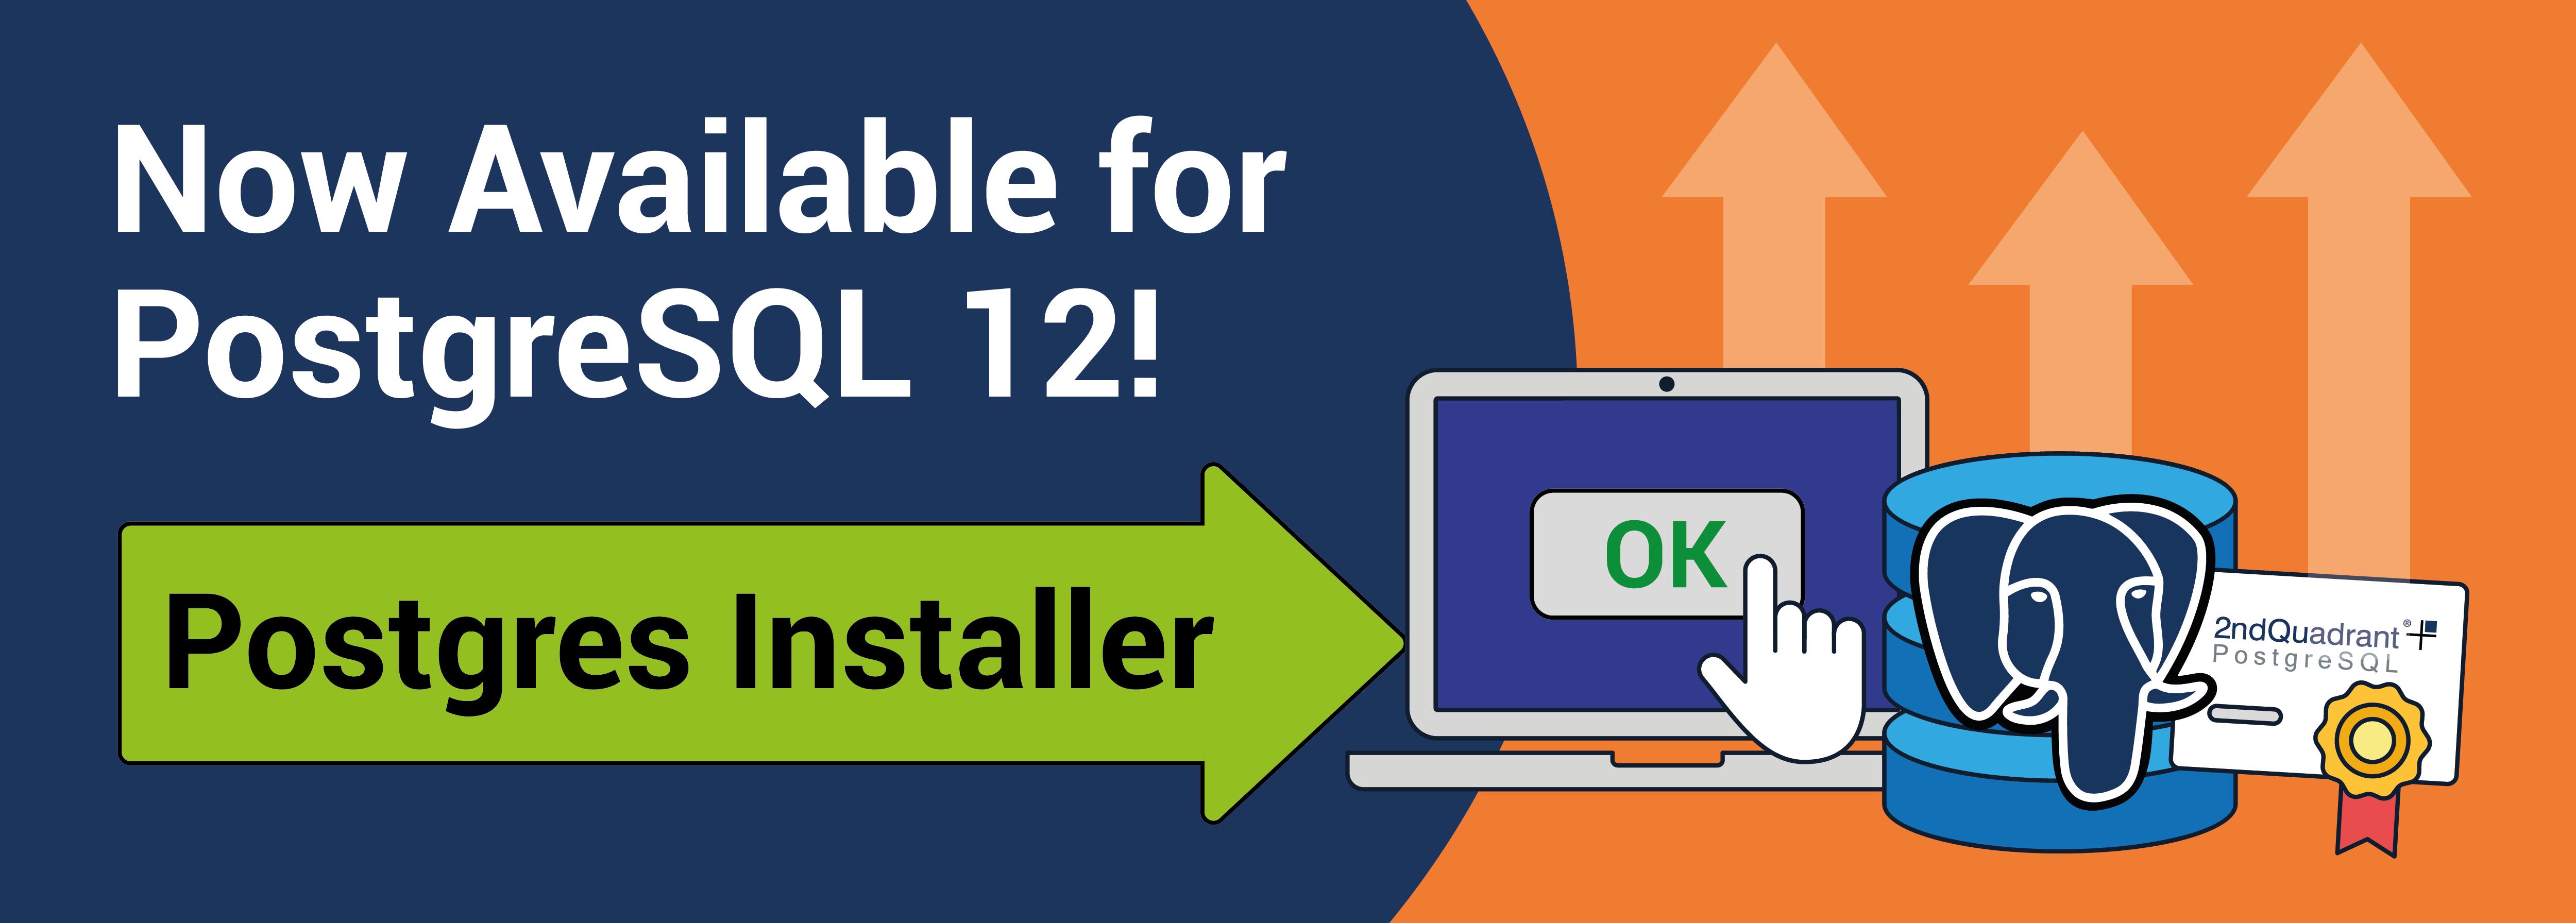 Now Available for PostgreSQL 12